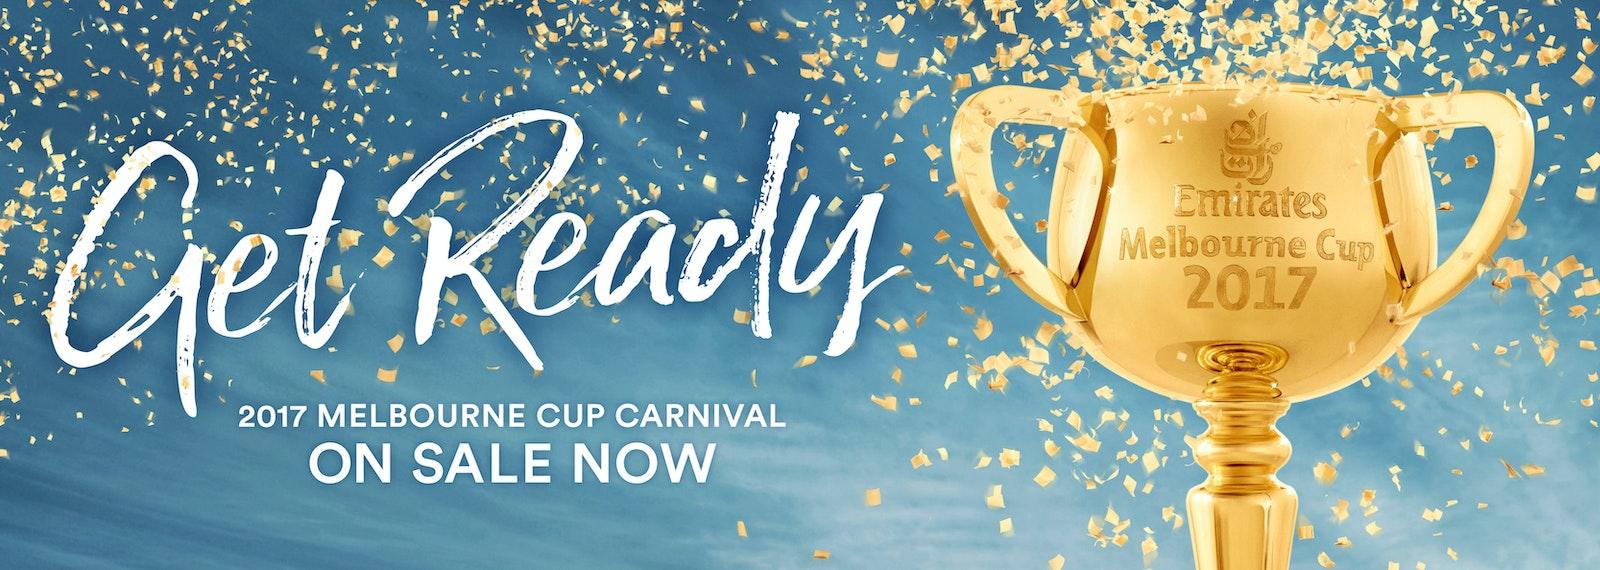 2017 MELBOURNE CUP CARNIVAL